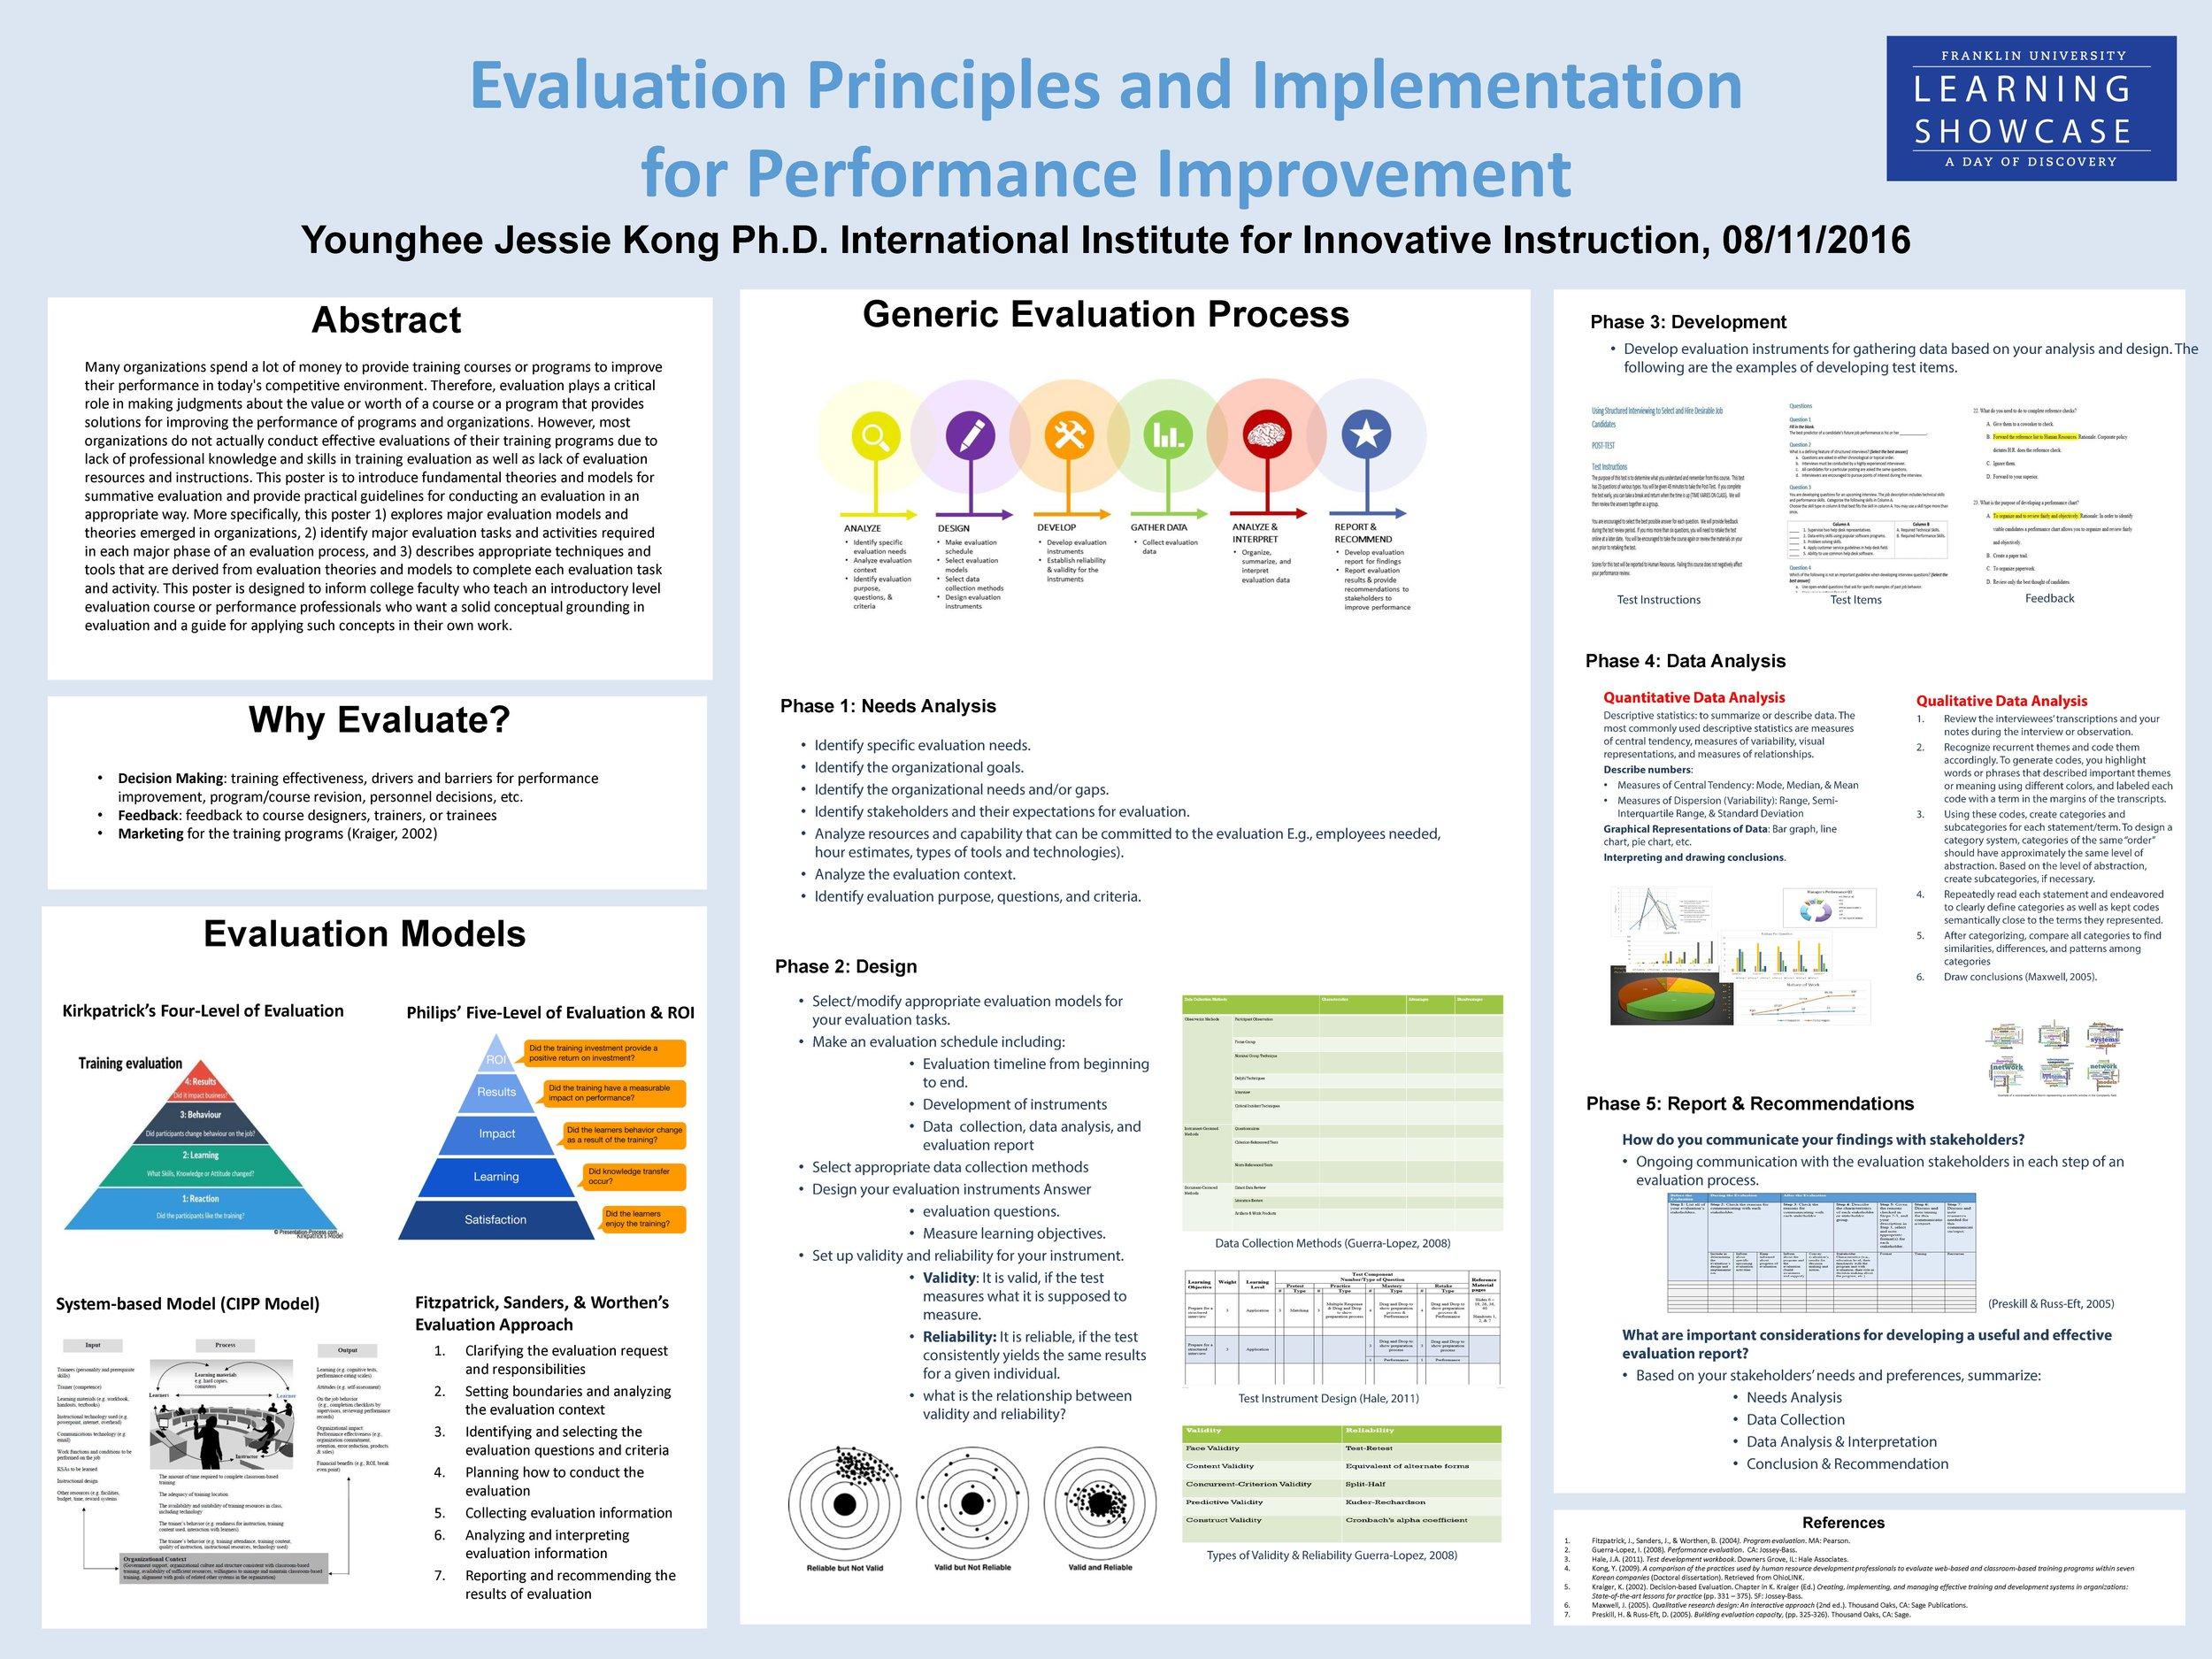 KongY EvaluationPrinciplesImplementation.jpg